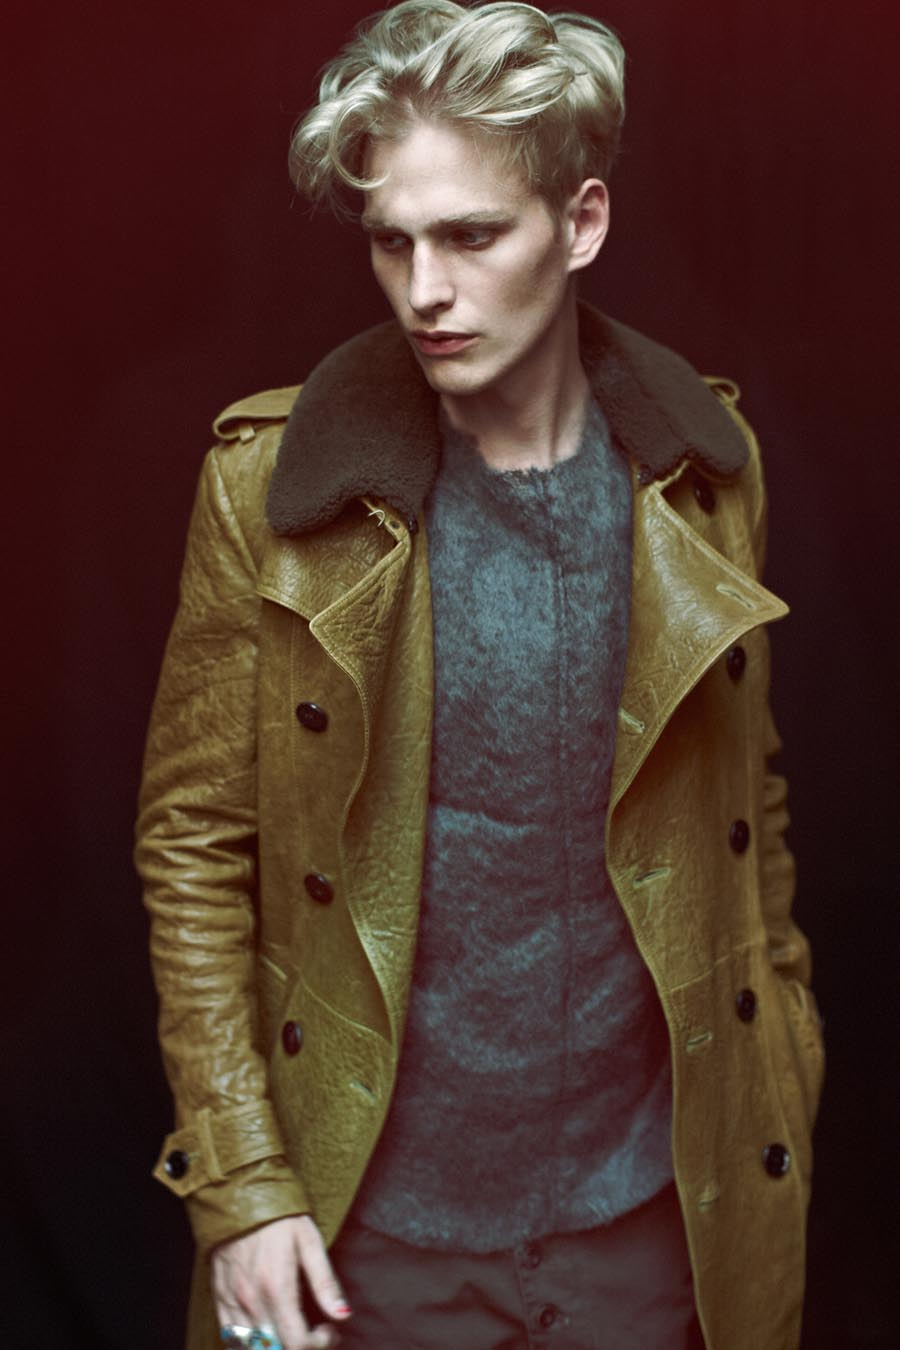 Italian Boy Name: Gerhard Freidl For Maxim